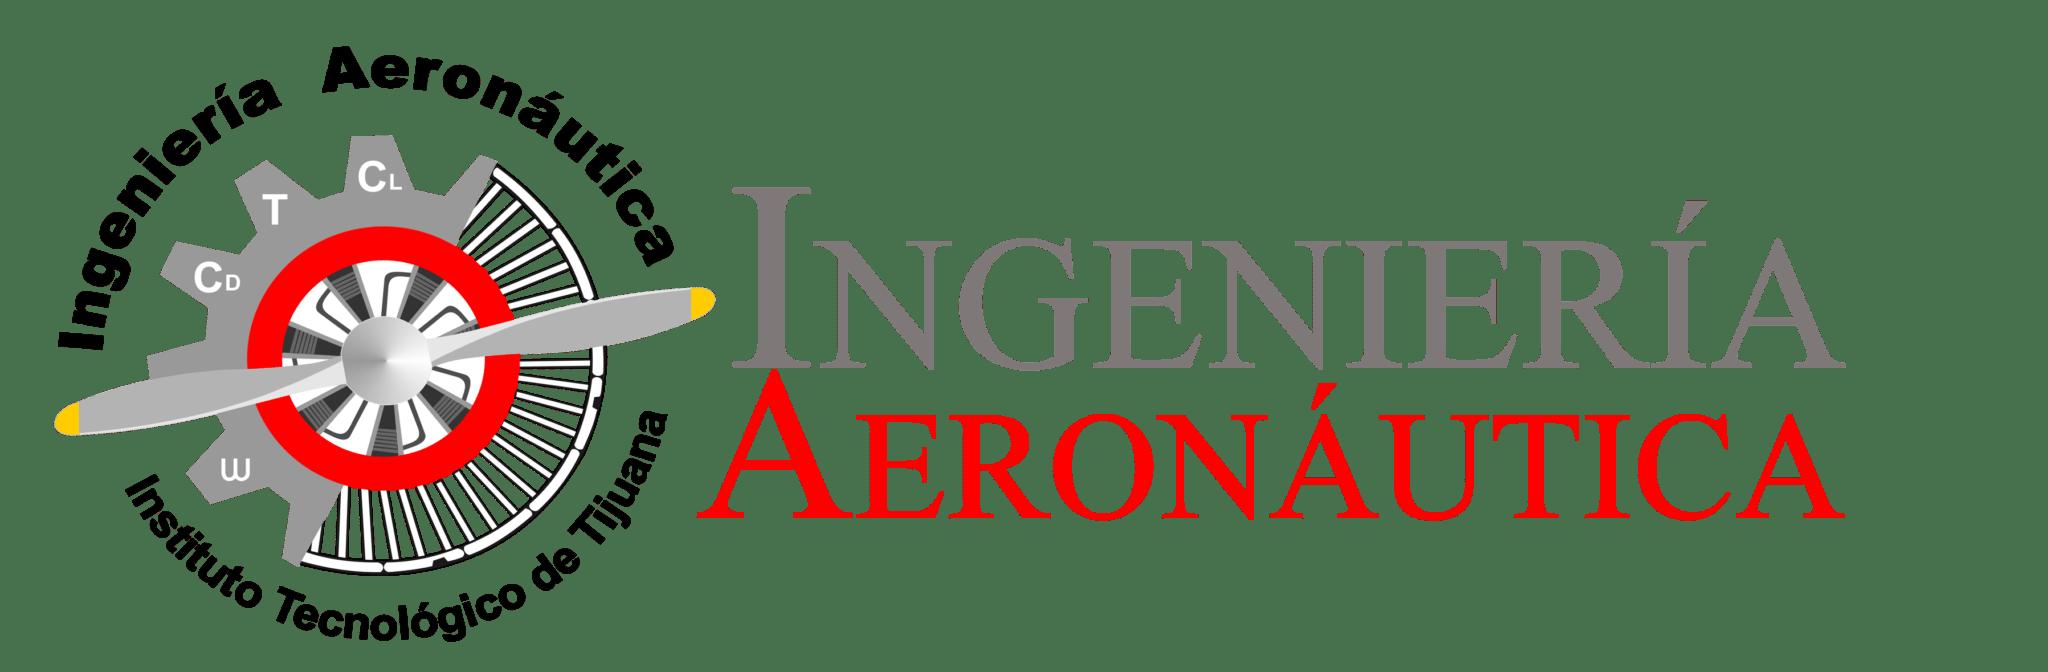 AERONAUTICA_HEADING